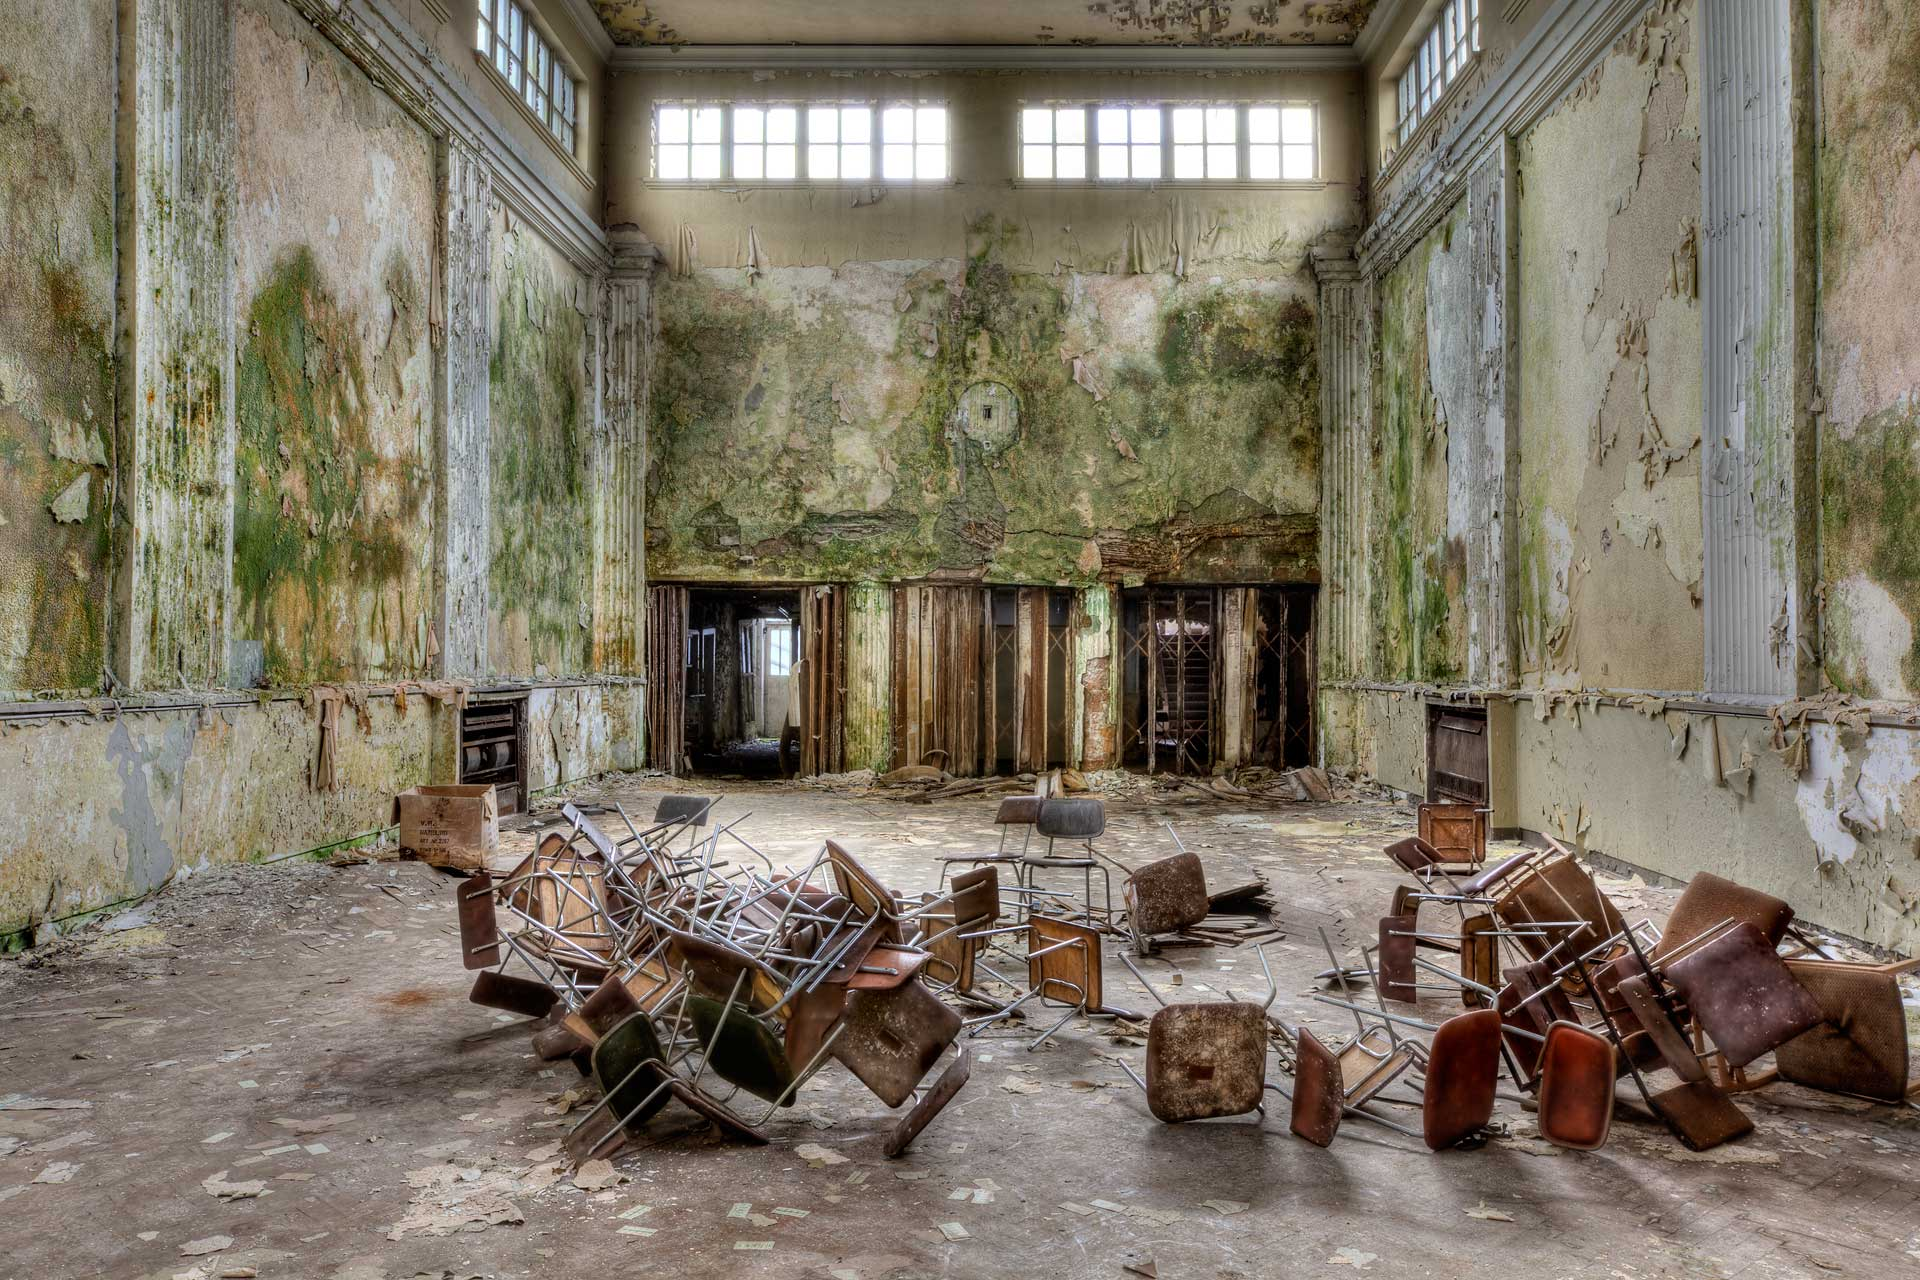 Wastelands (Julien CRESP)